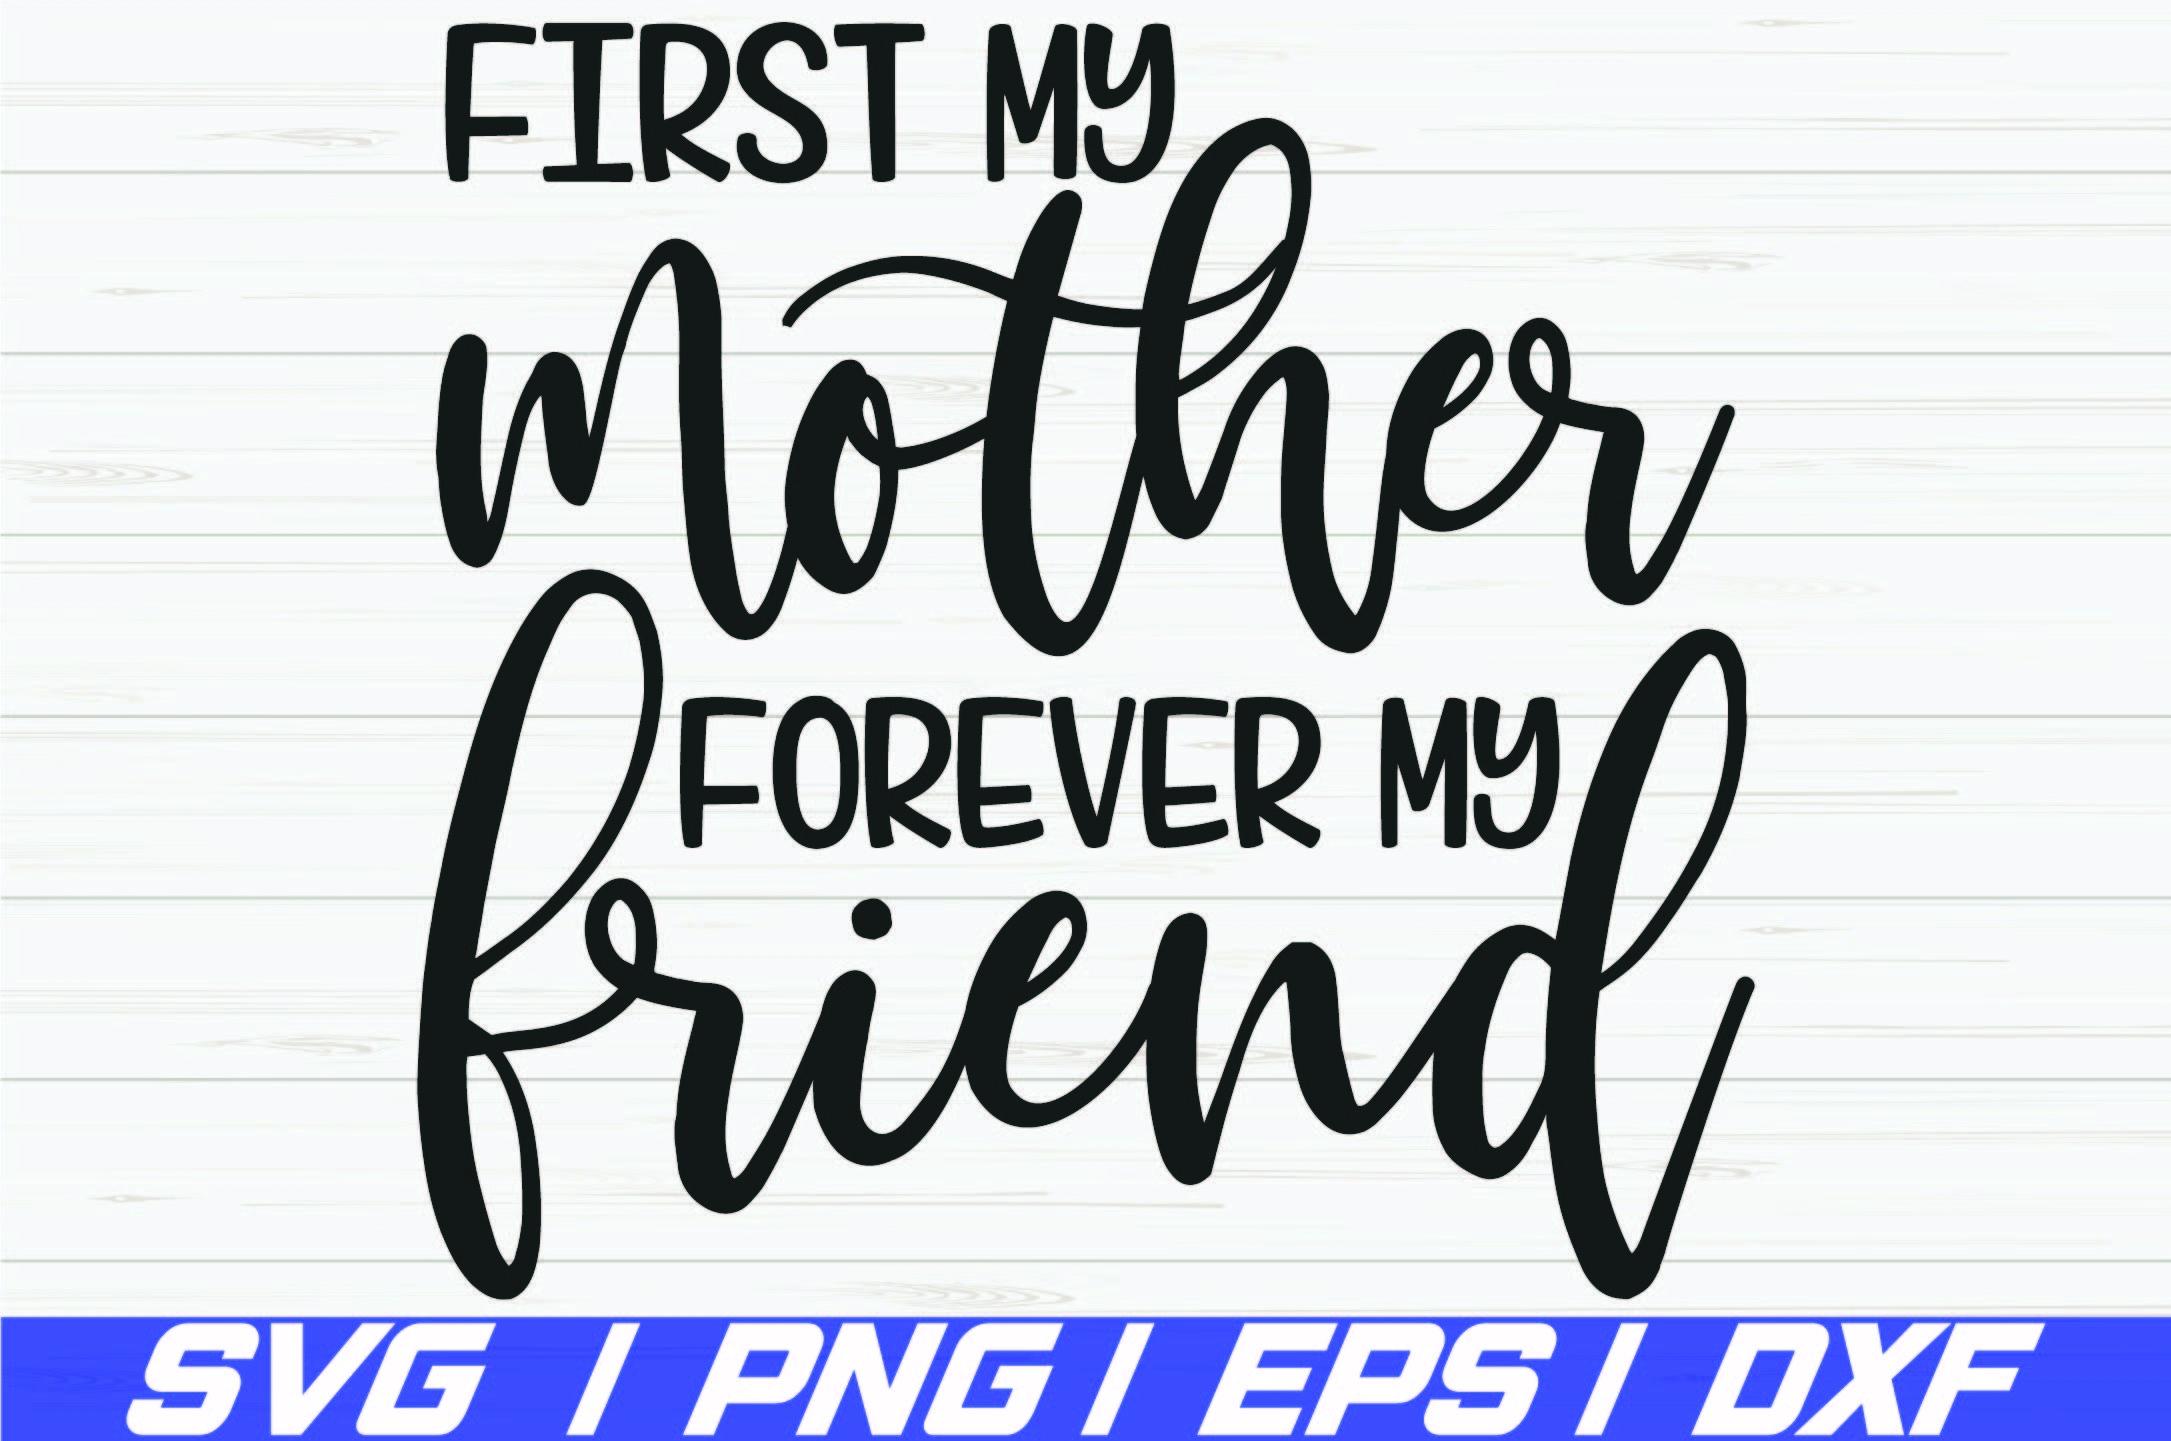 First My Mother Forever My Friend Svg Cut File Cricut 566955 Cut Files Design Bundles